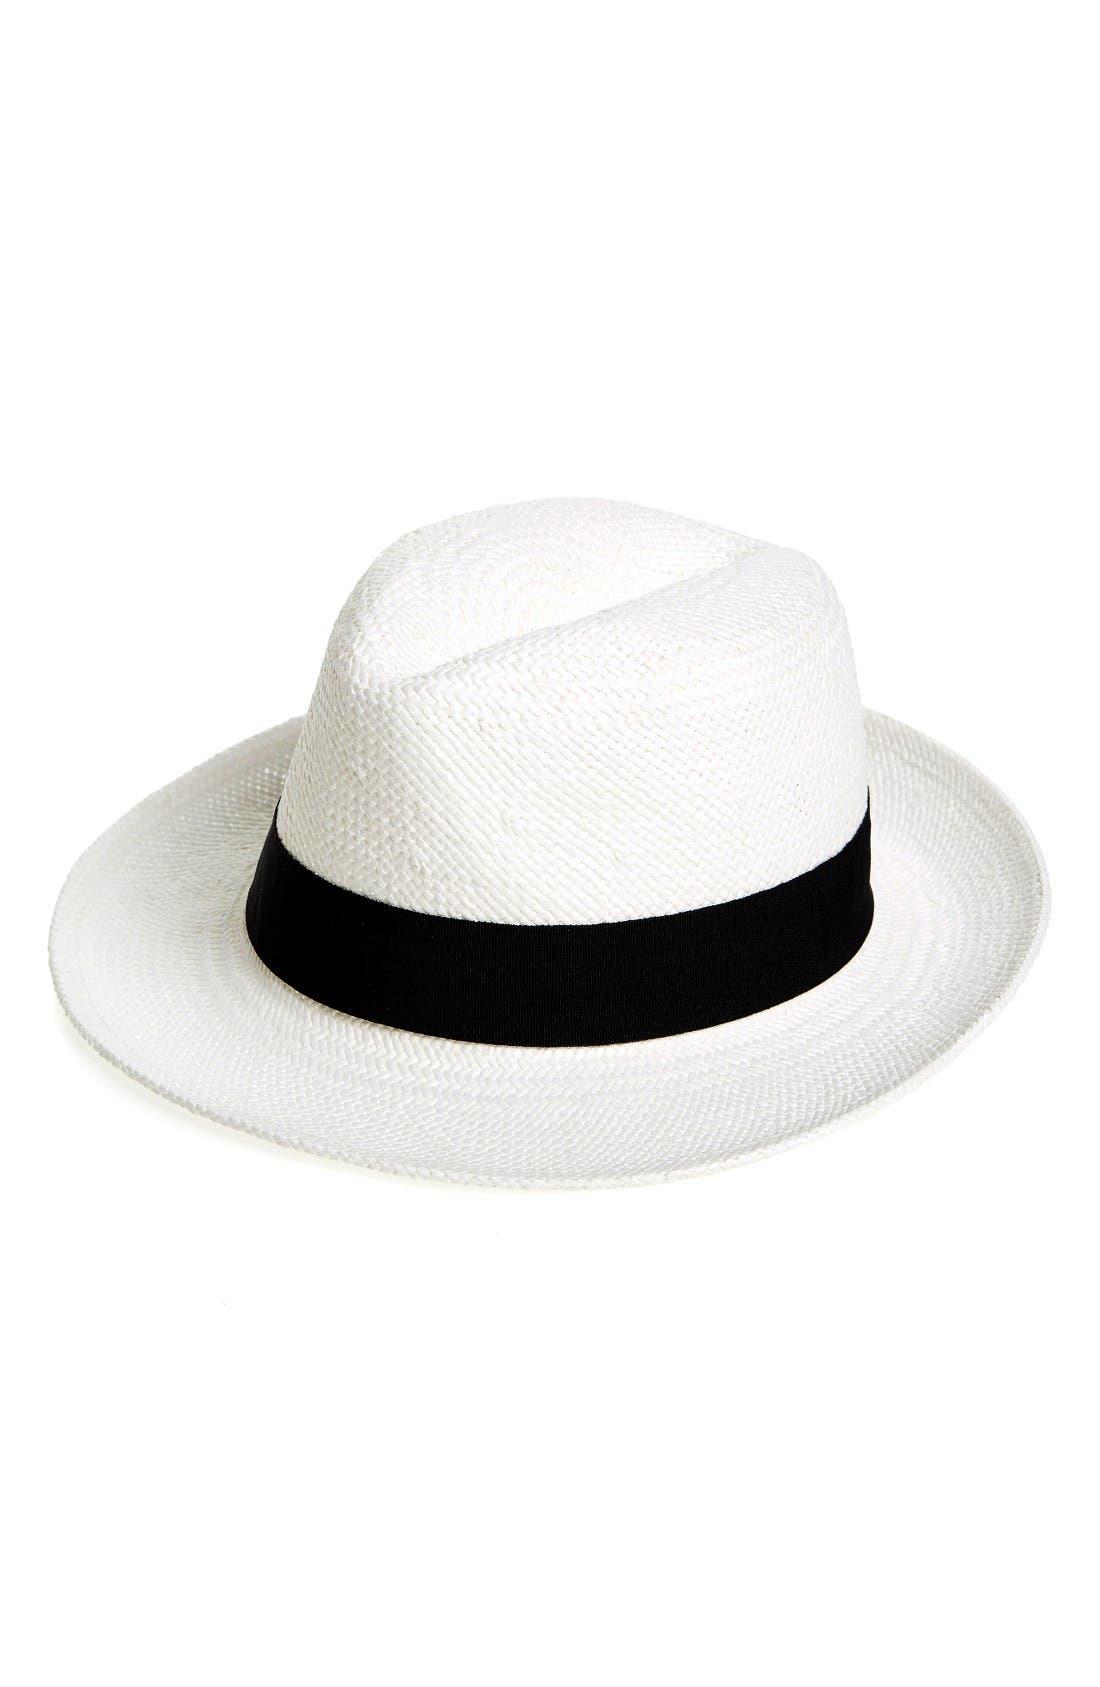 Straw Panama Hat,                         Main,                         color, White